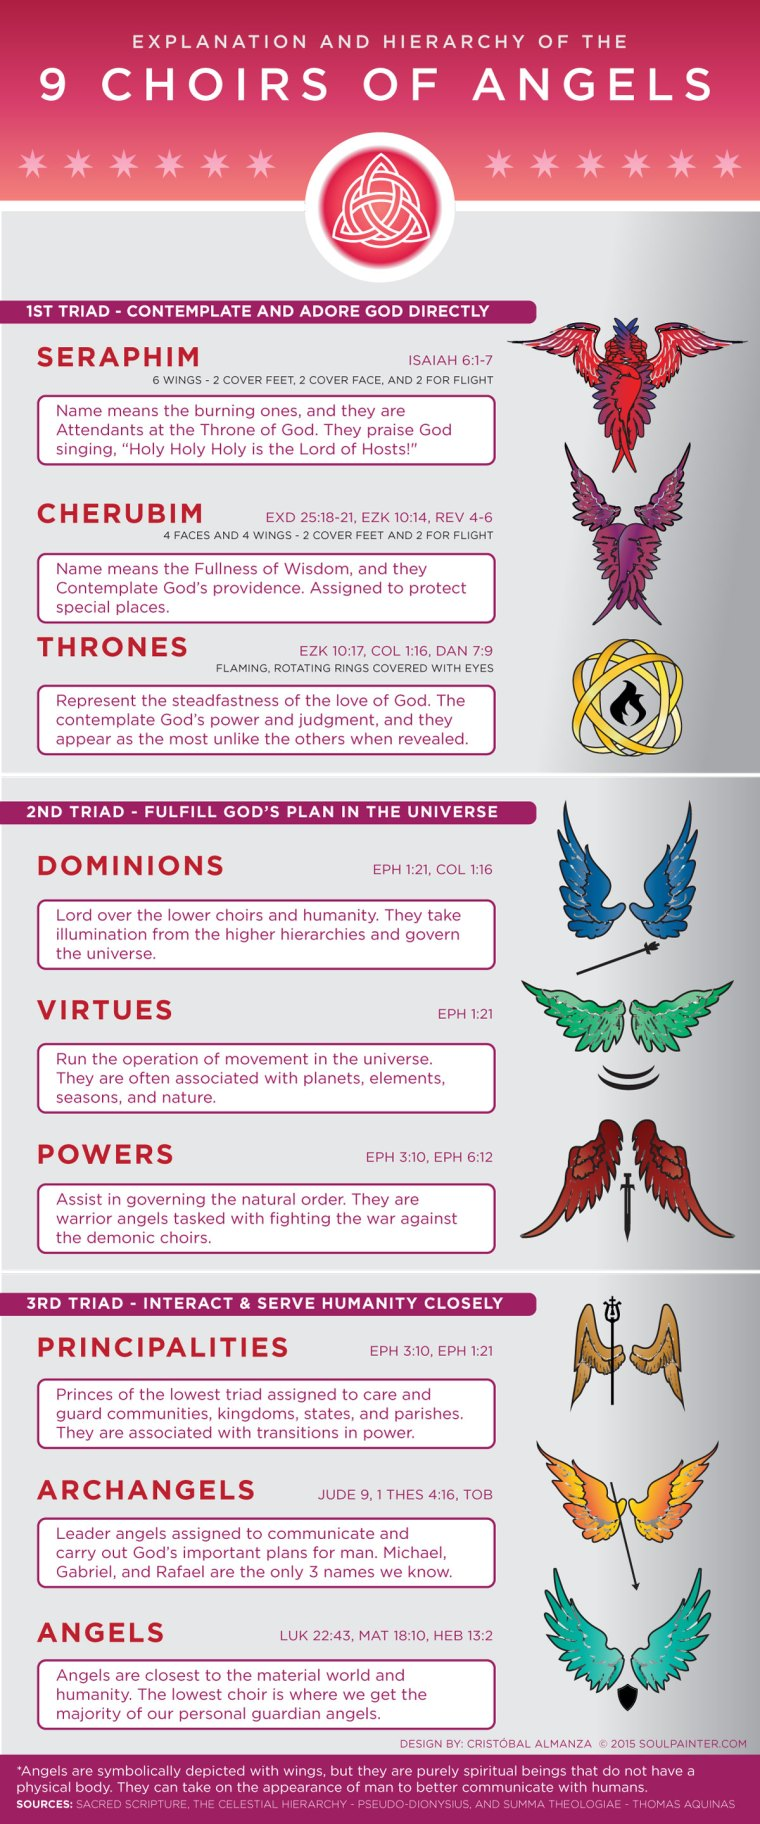 9ChoirsofAngels-Infographic